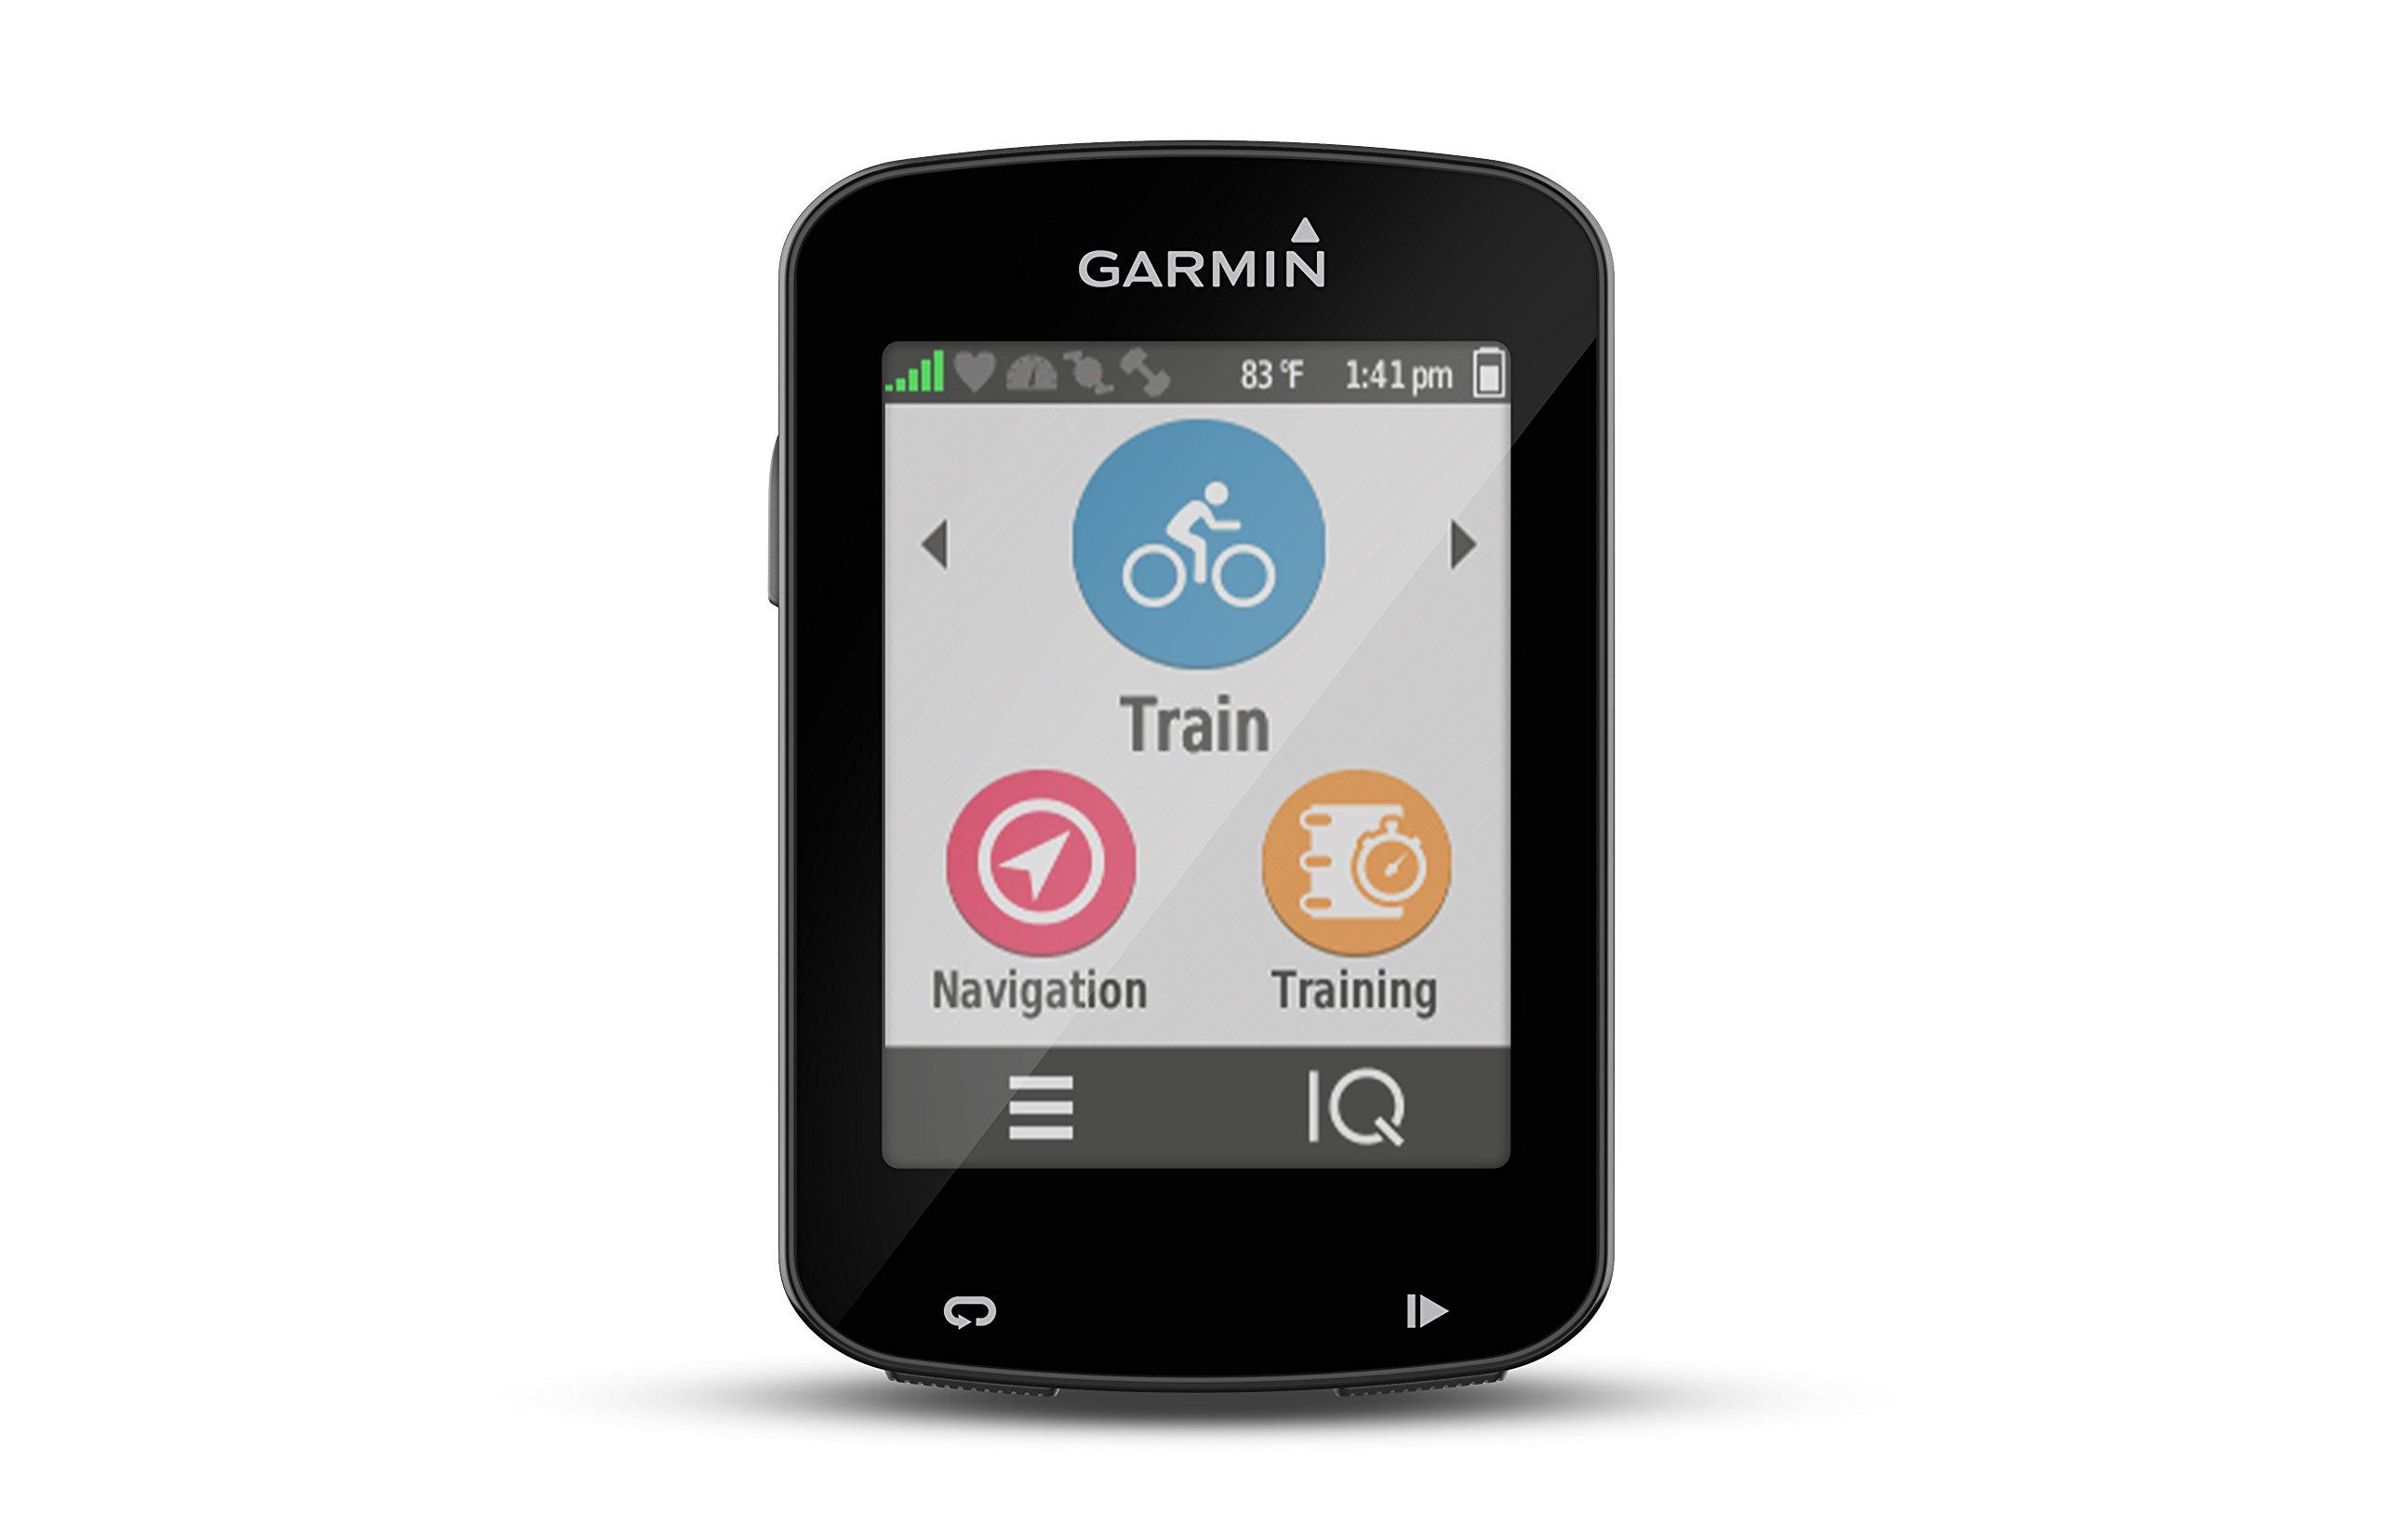 Garmin Edge 820, GPS Cycling/Bike Computer for Performance and Racing by Garmin